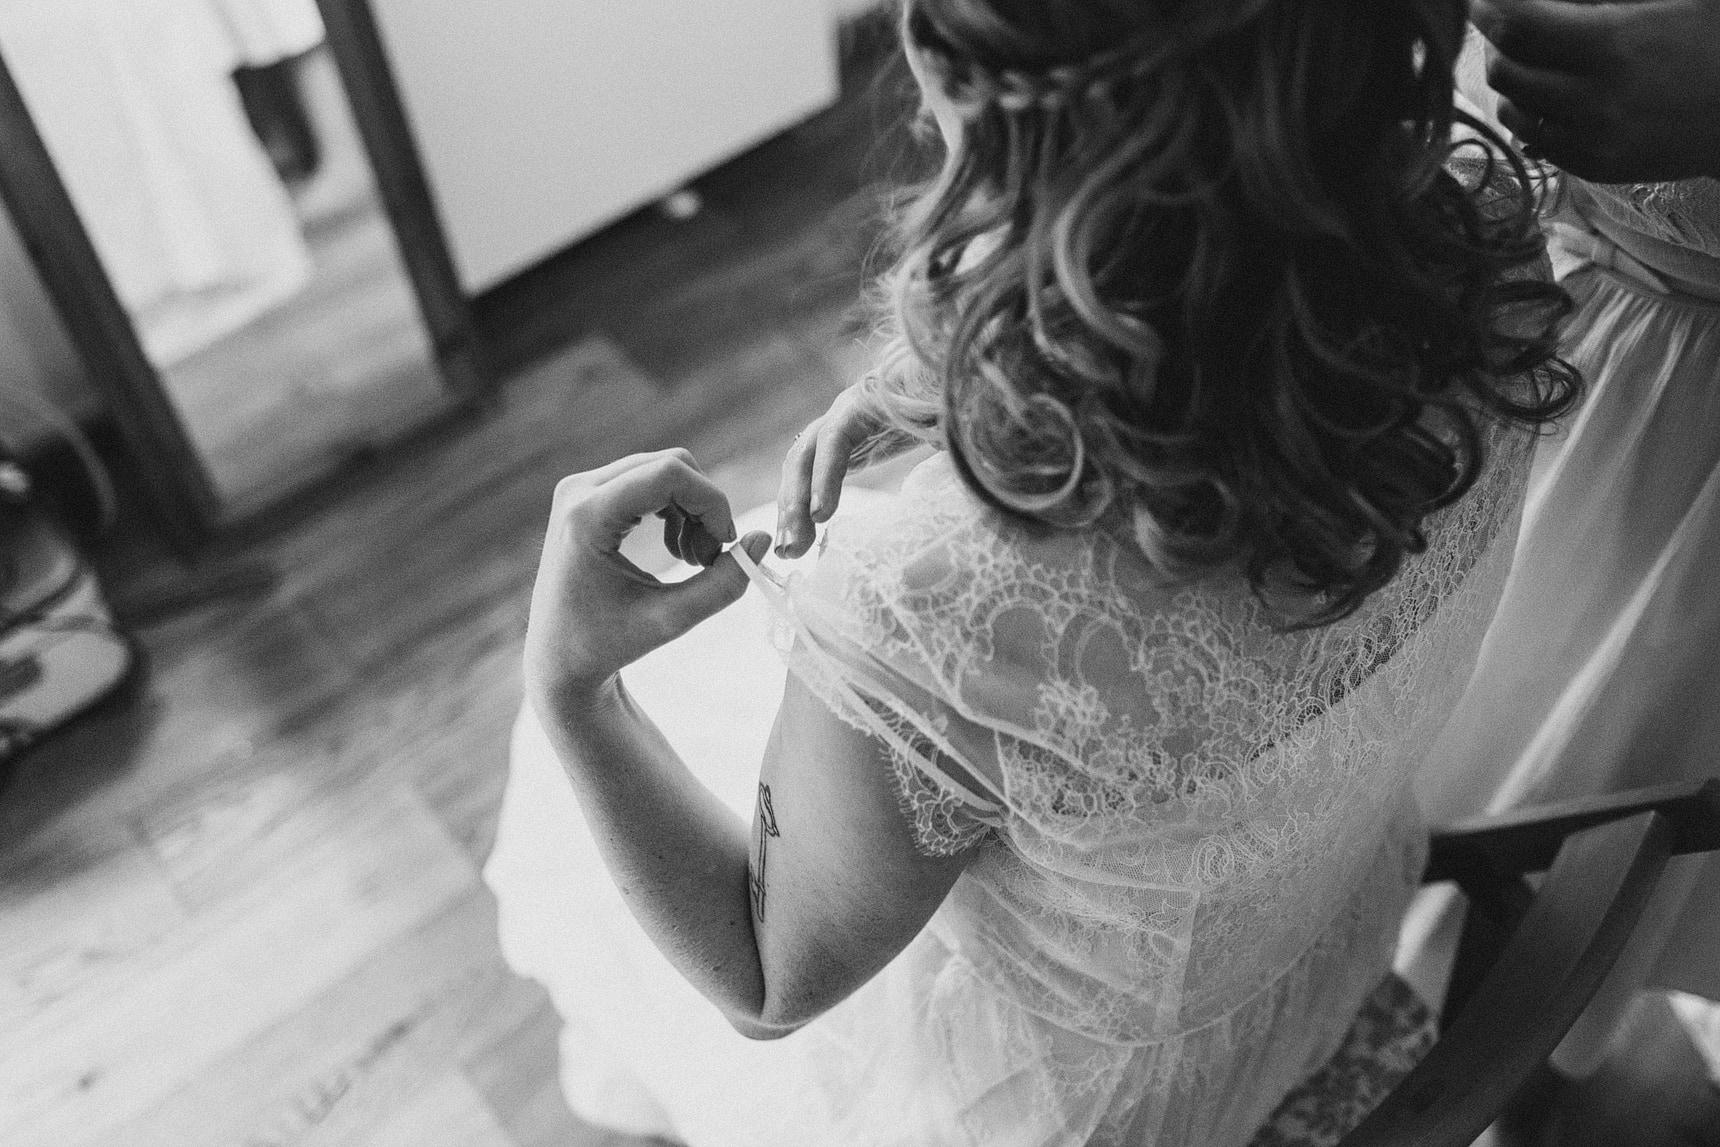 artistic wedding photographer oxfordshire